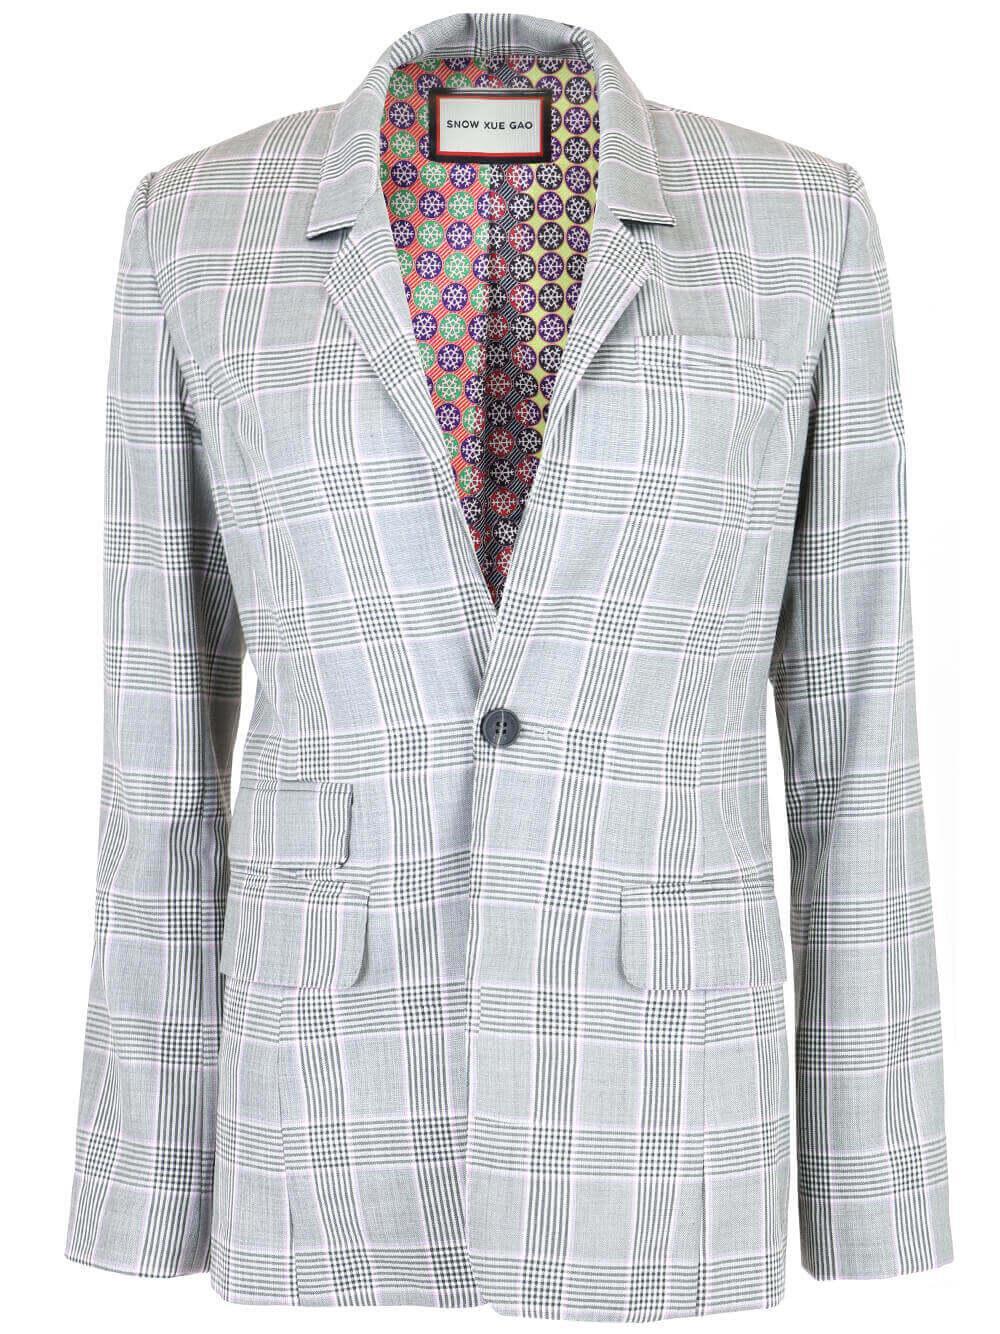 Single Breasted Jacket Item # JACKET018F